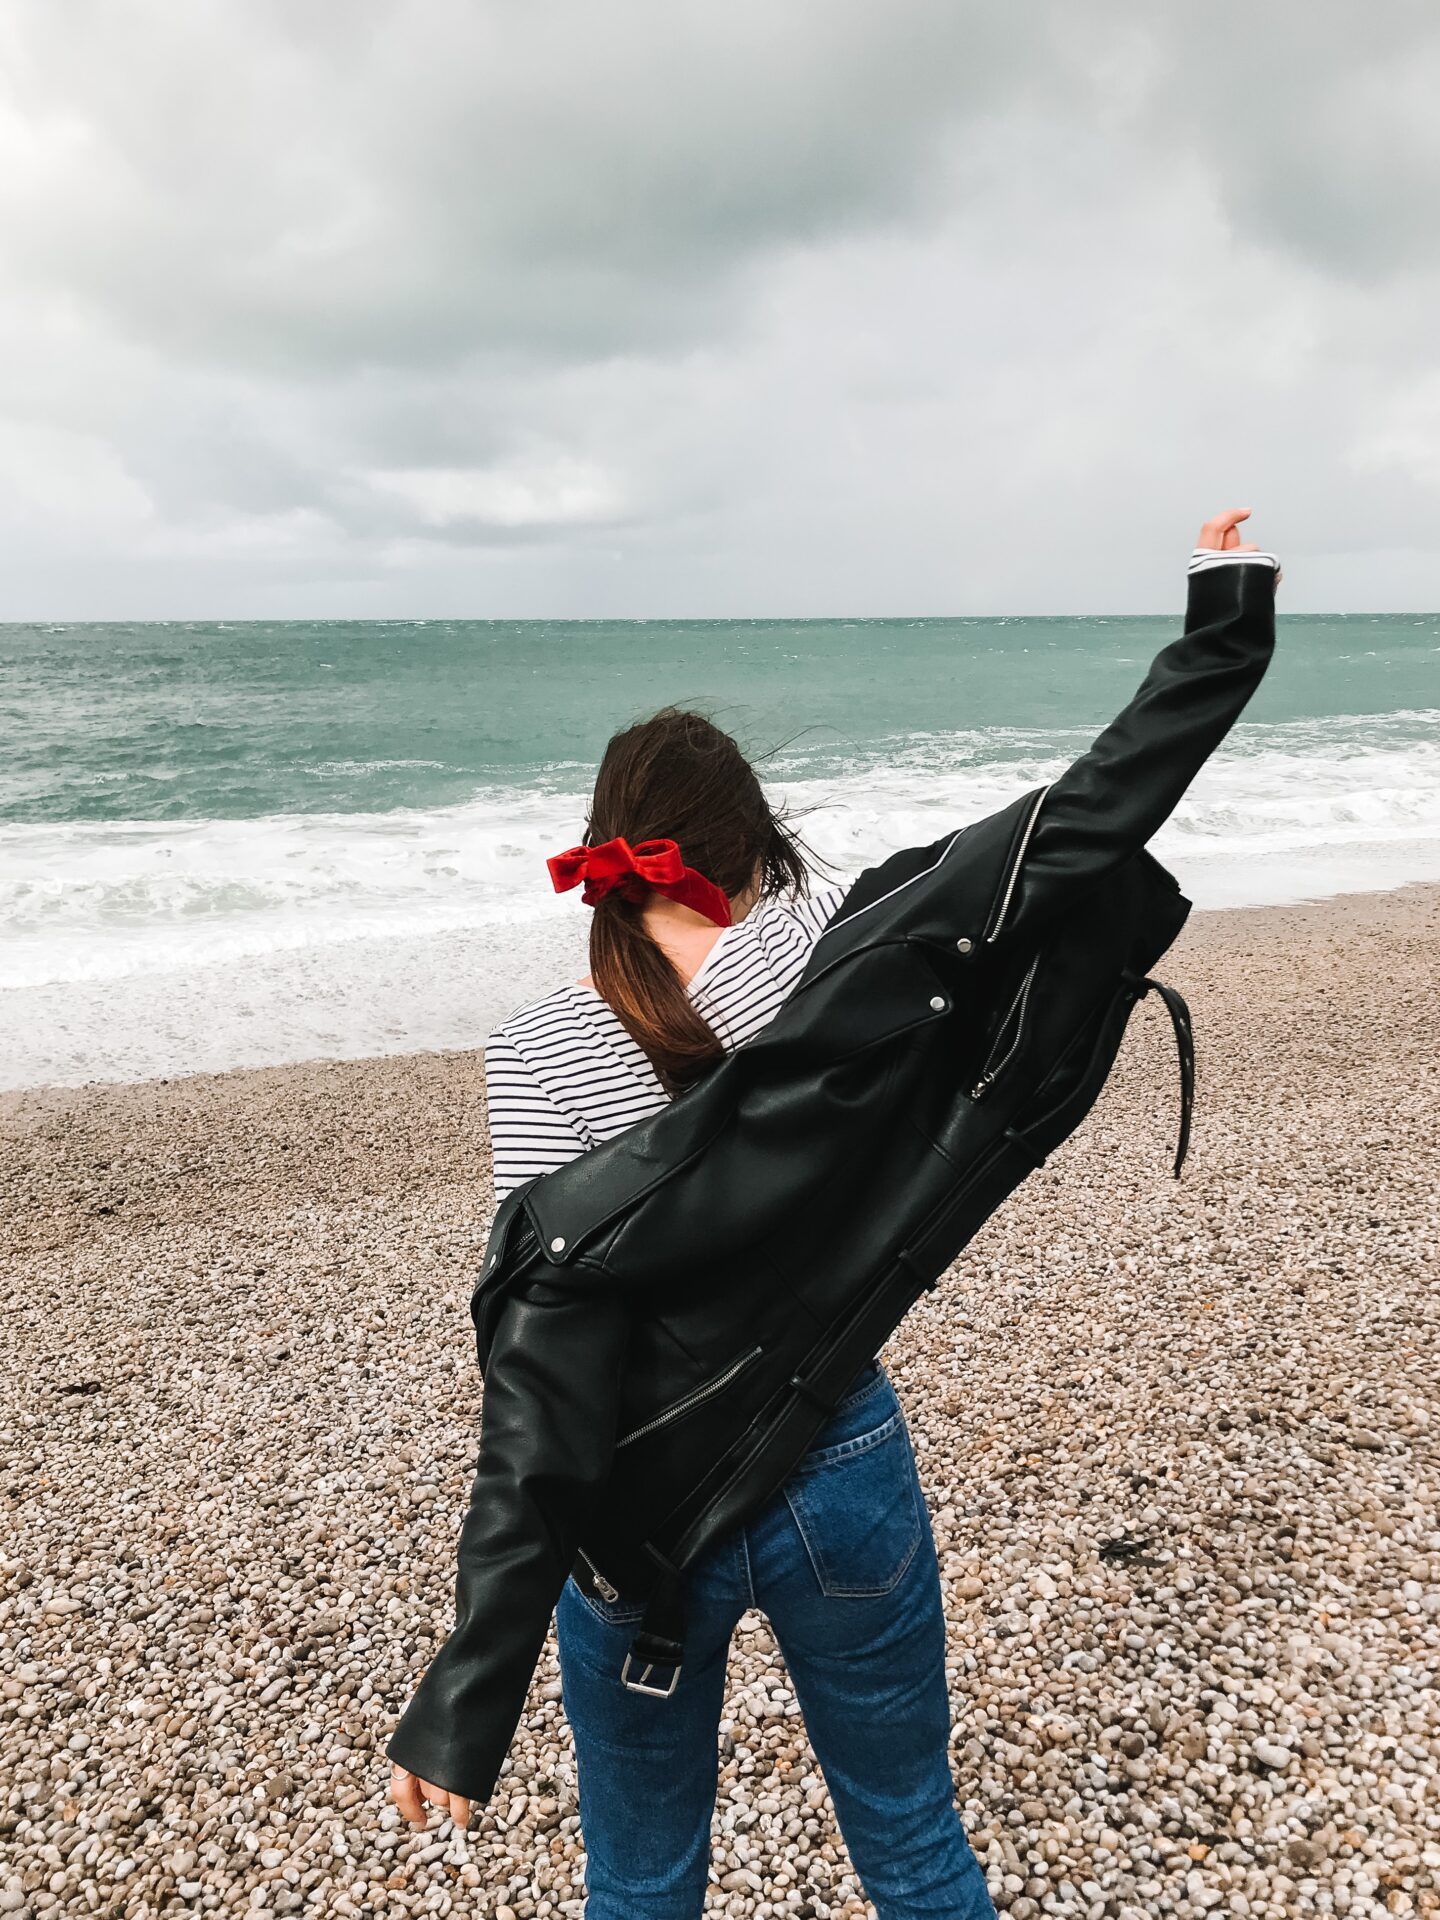 Women at the beach enjoying herself